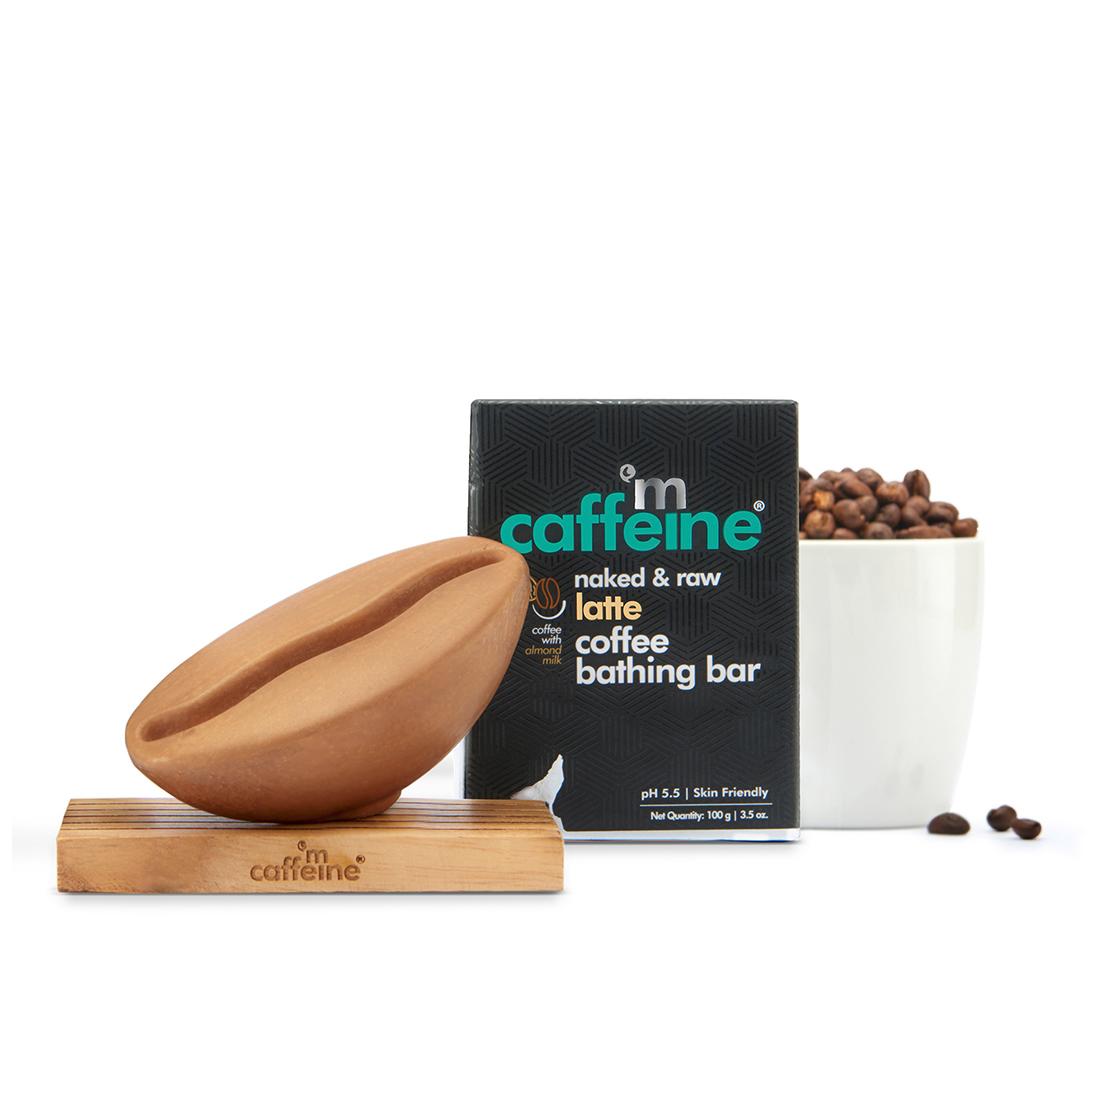 MCaffeine | mCaffeine Naked & Raw Latte Coffee Bathing Bar Soap for Moisturization with Almond Milk (100 g)